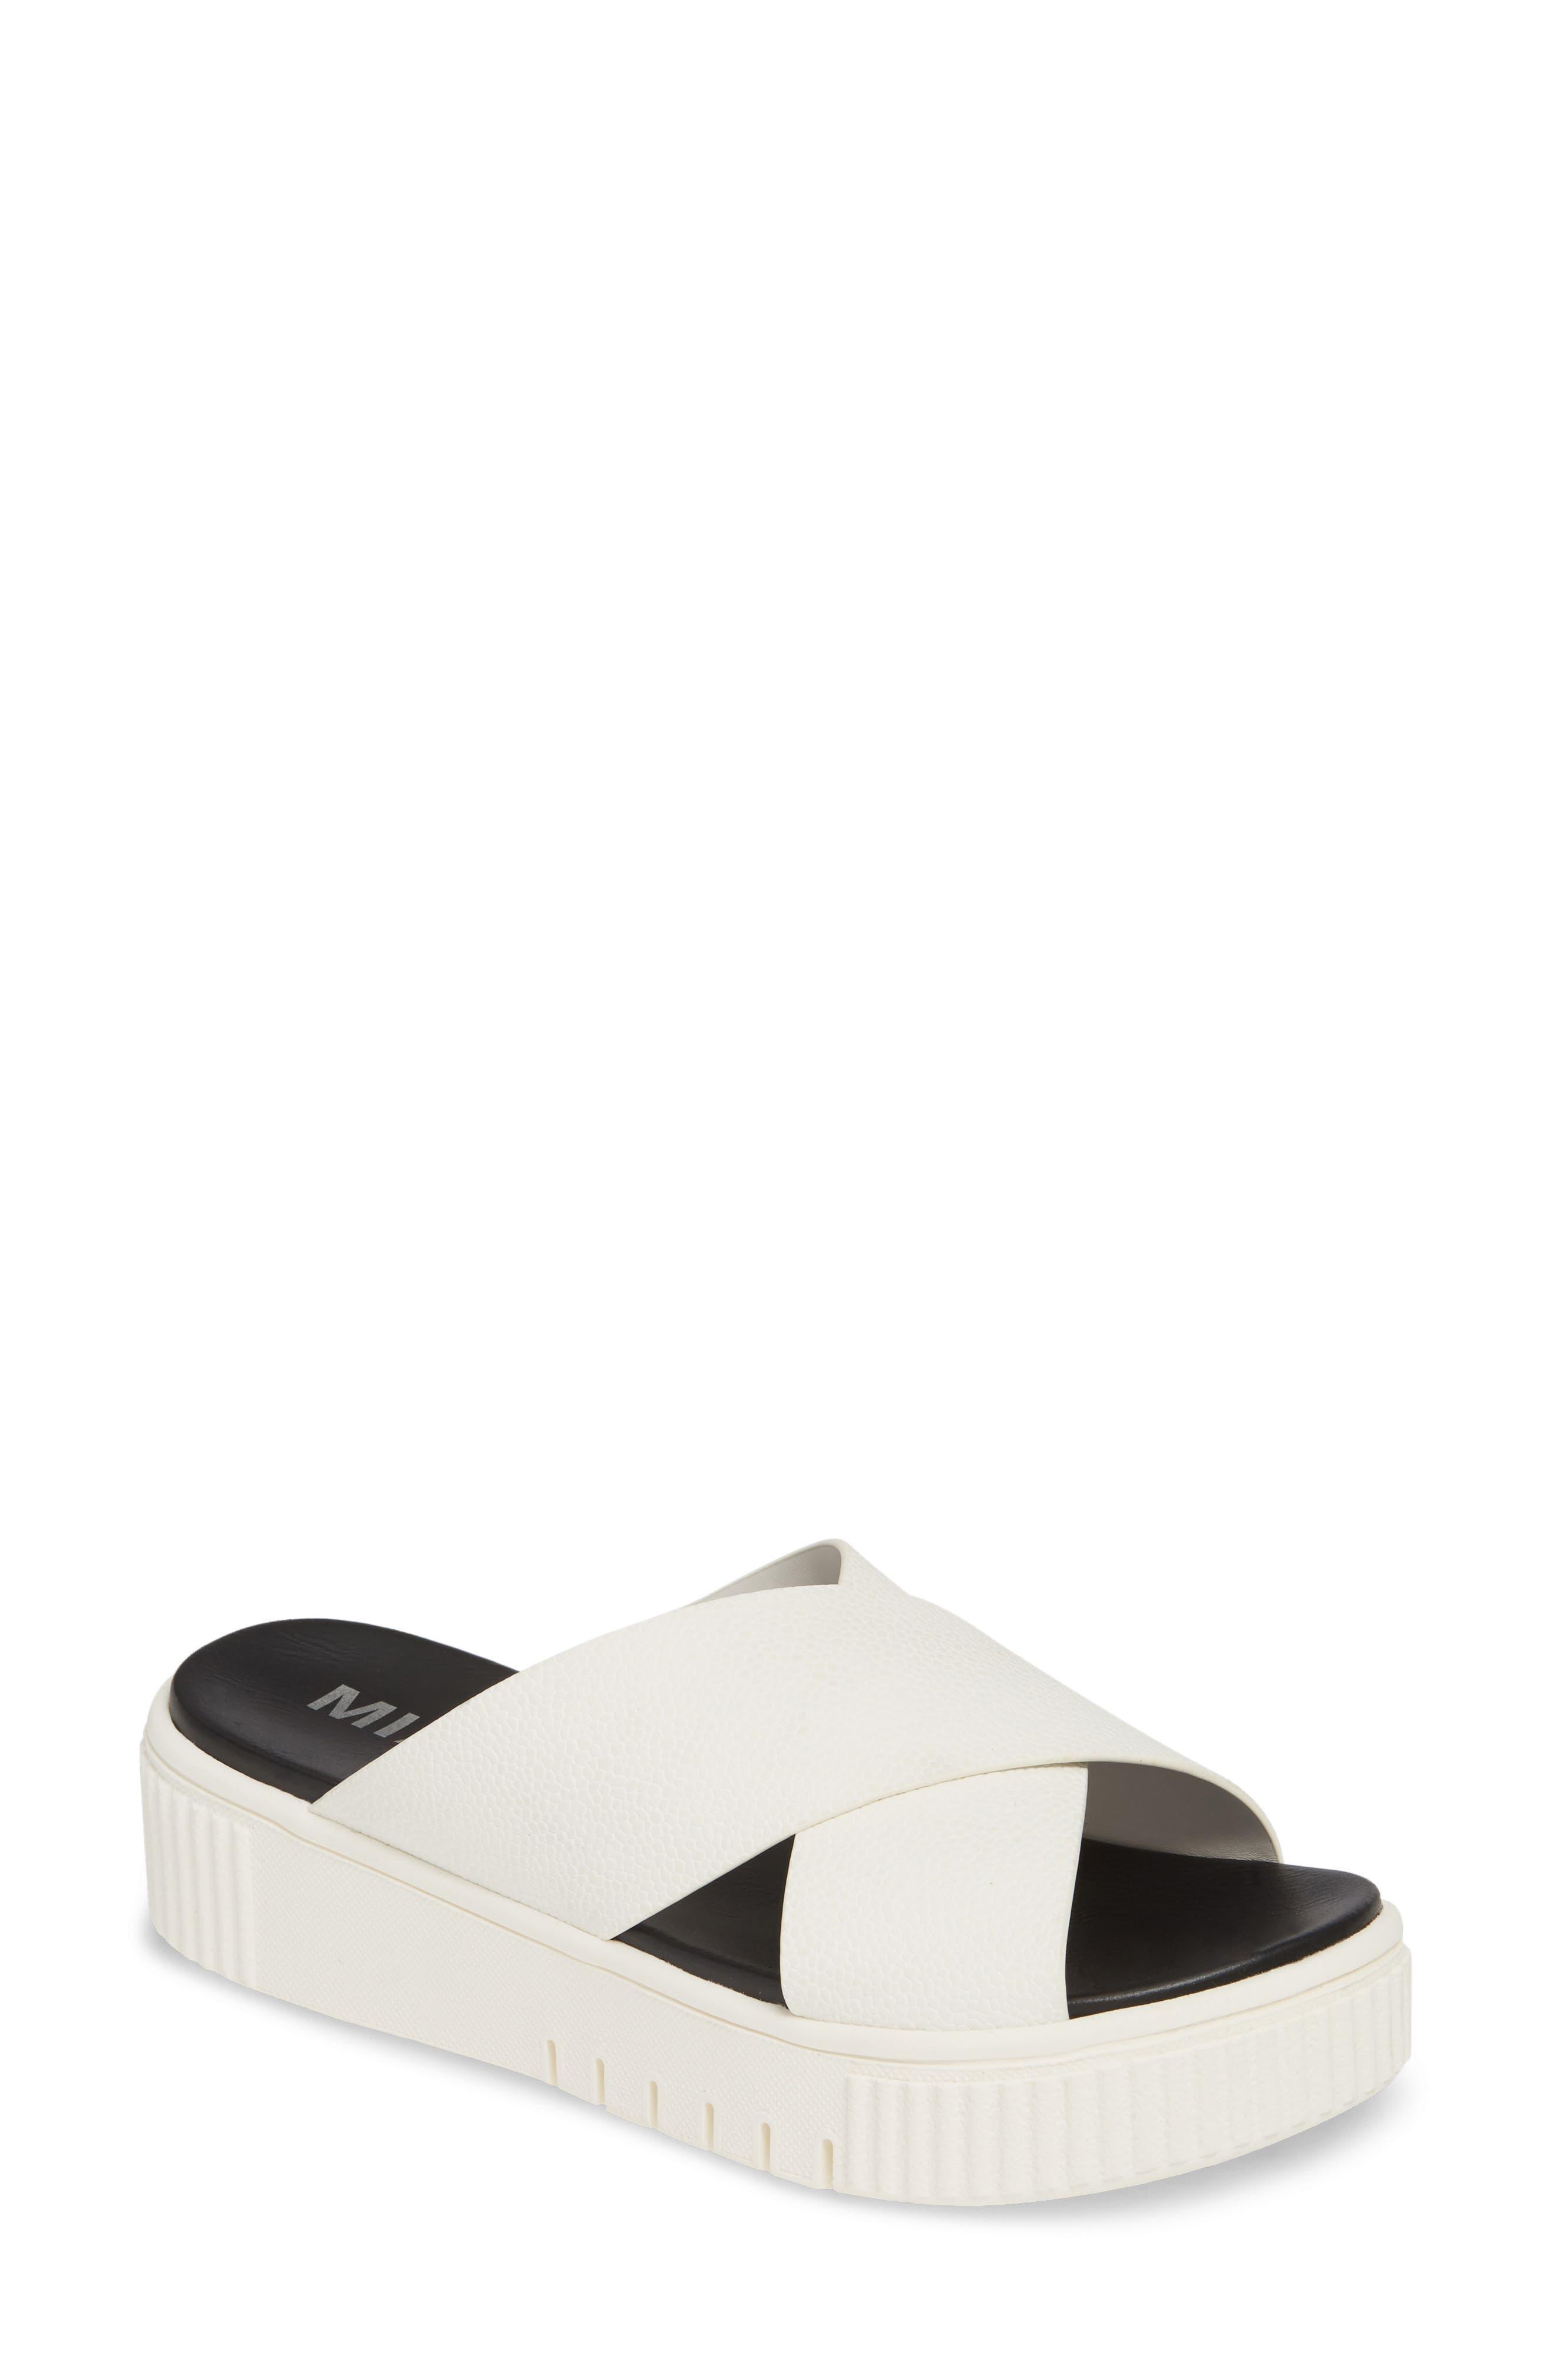 Mia Lia Platform Sandal, White